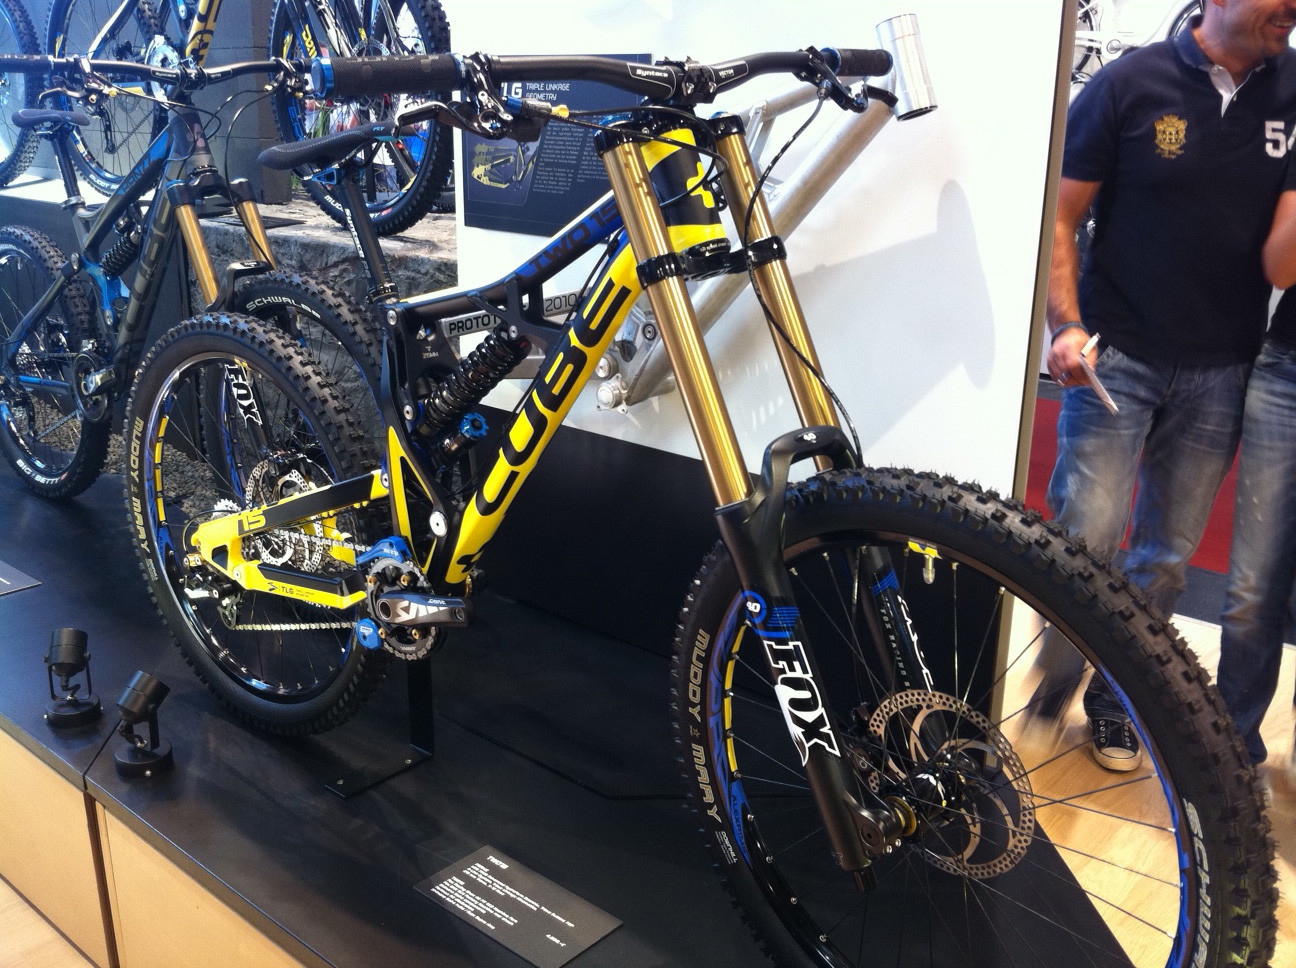 Cube Two15 - Eurobike 2011 - Mountain Biking Pictures - Vital MTB